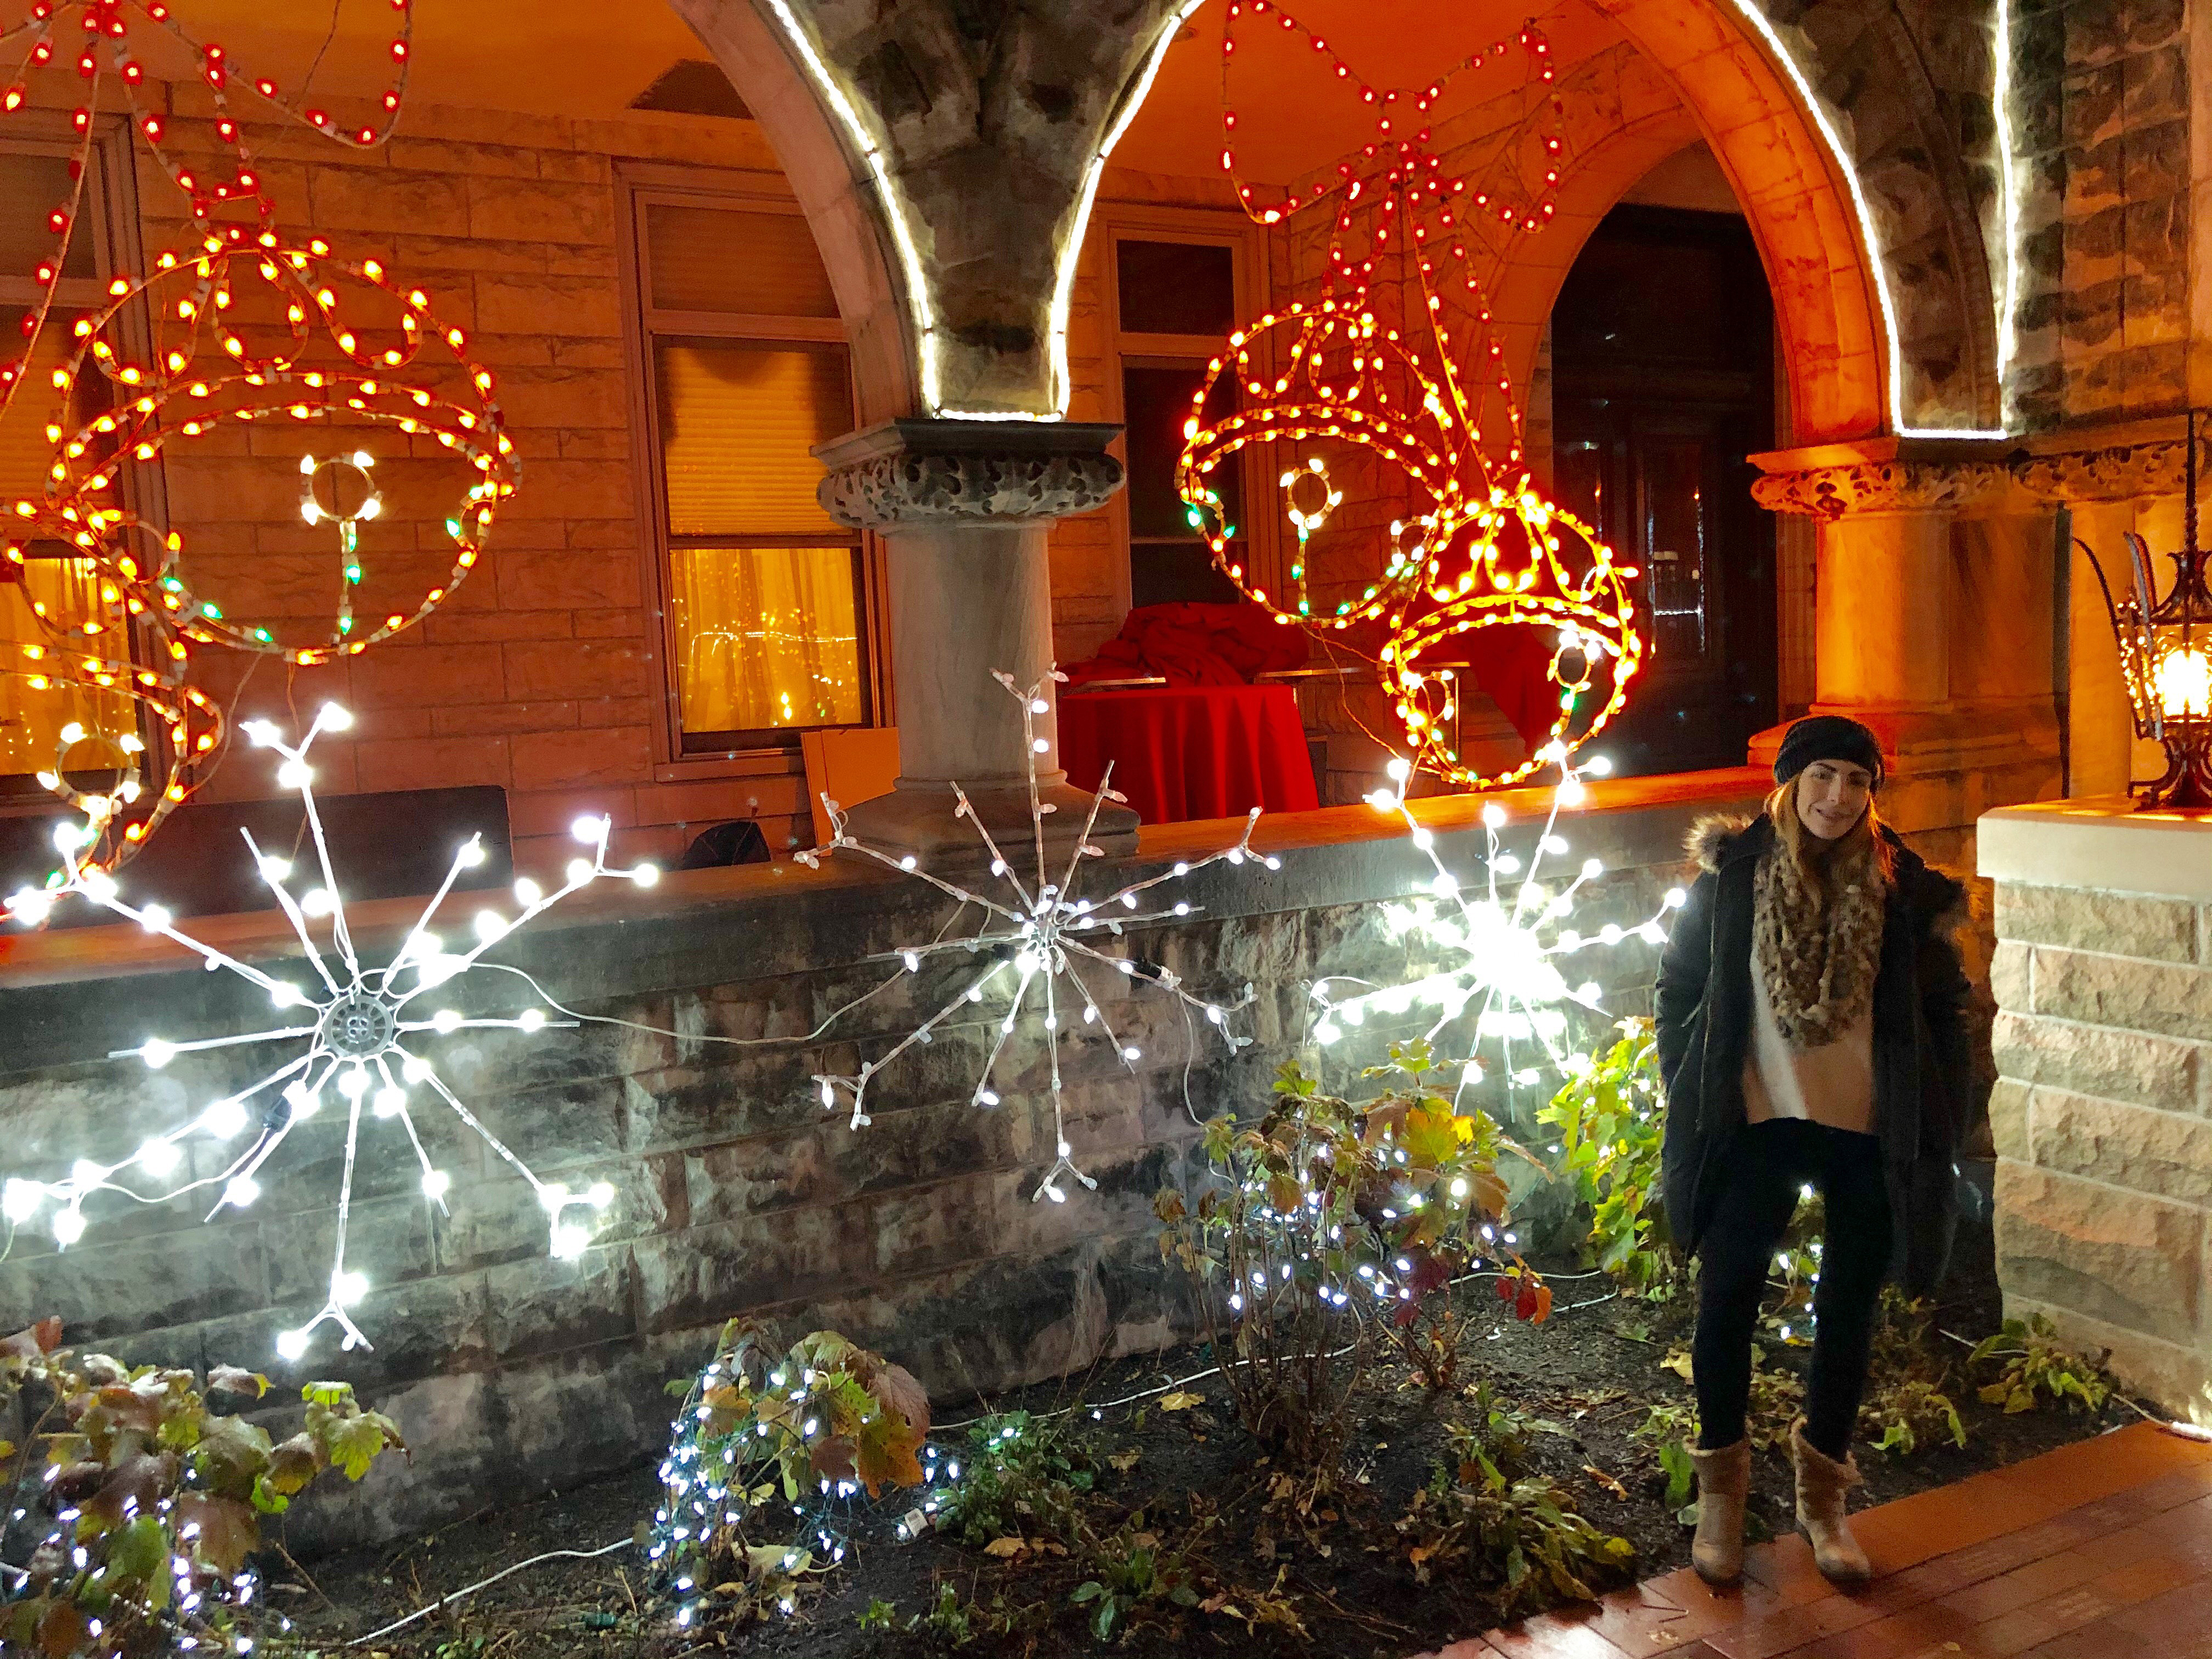 Katie_Kerl_holiday_greetings